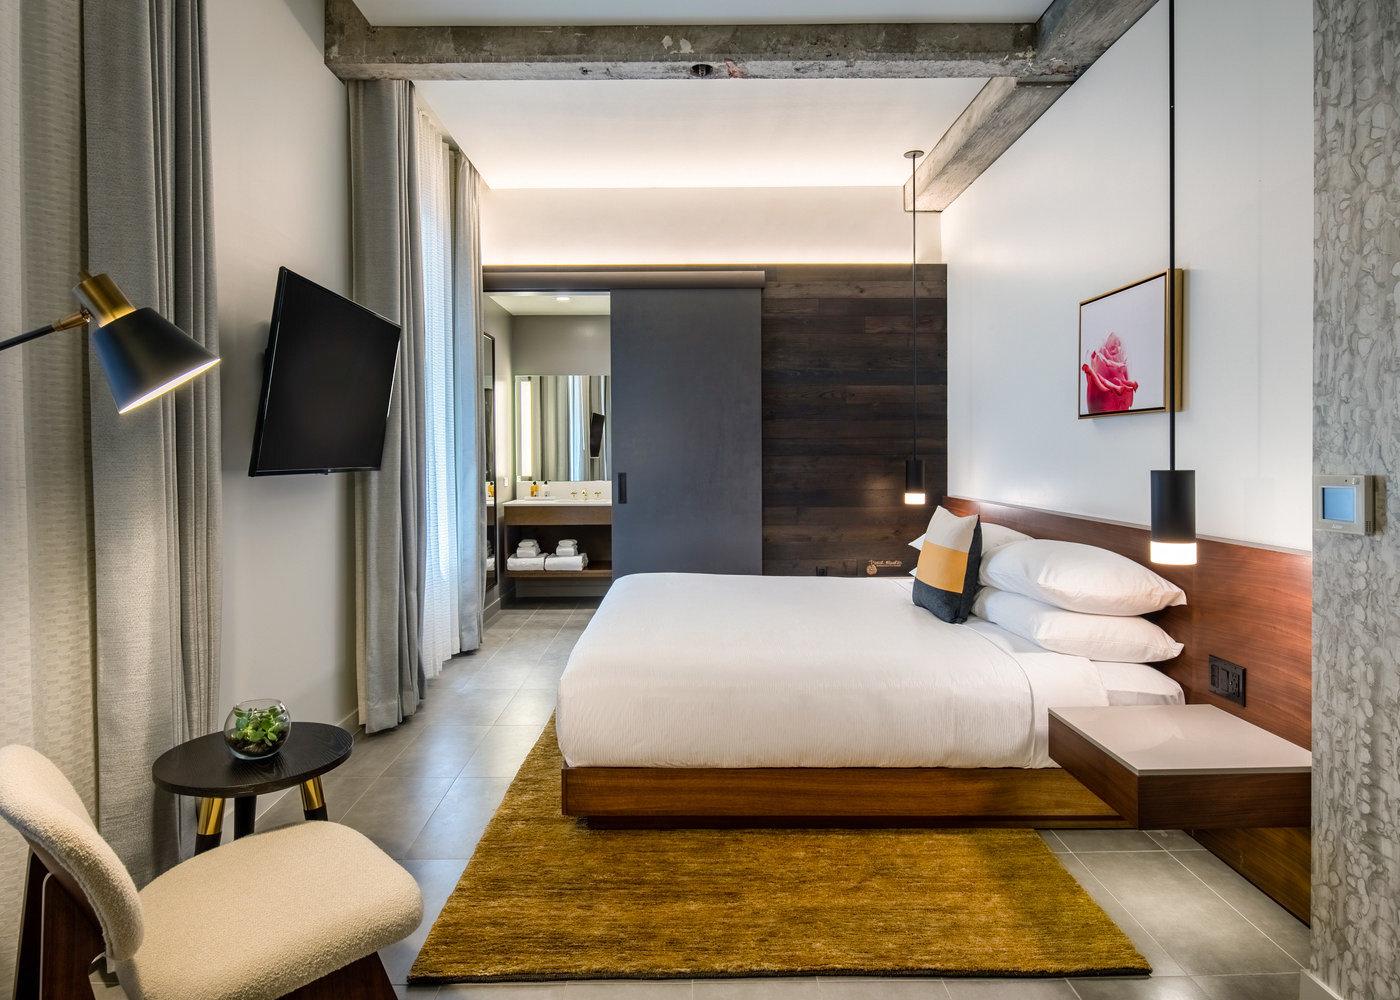 Boutique Hotels Luxury Travel Indoor Wall Floor Room Interior Design Living Ceiling Suite Bed Frame